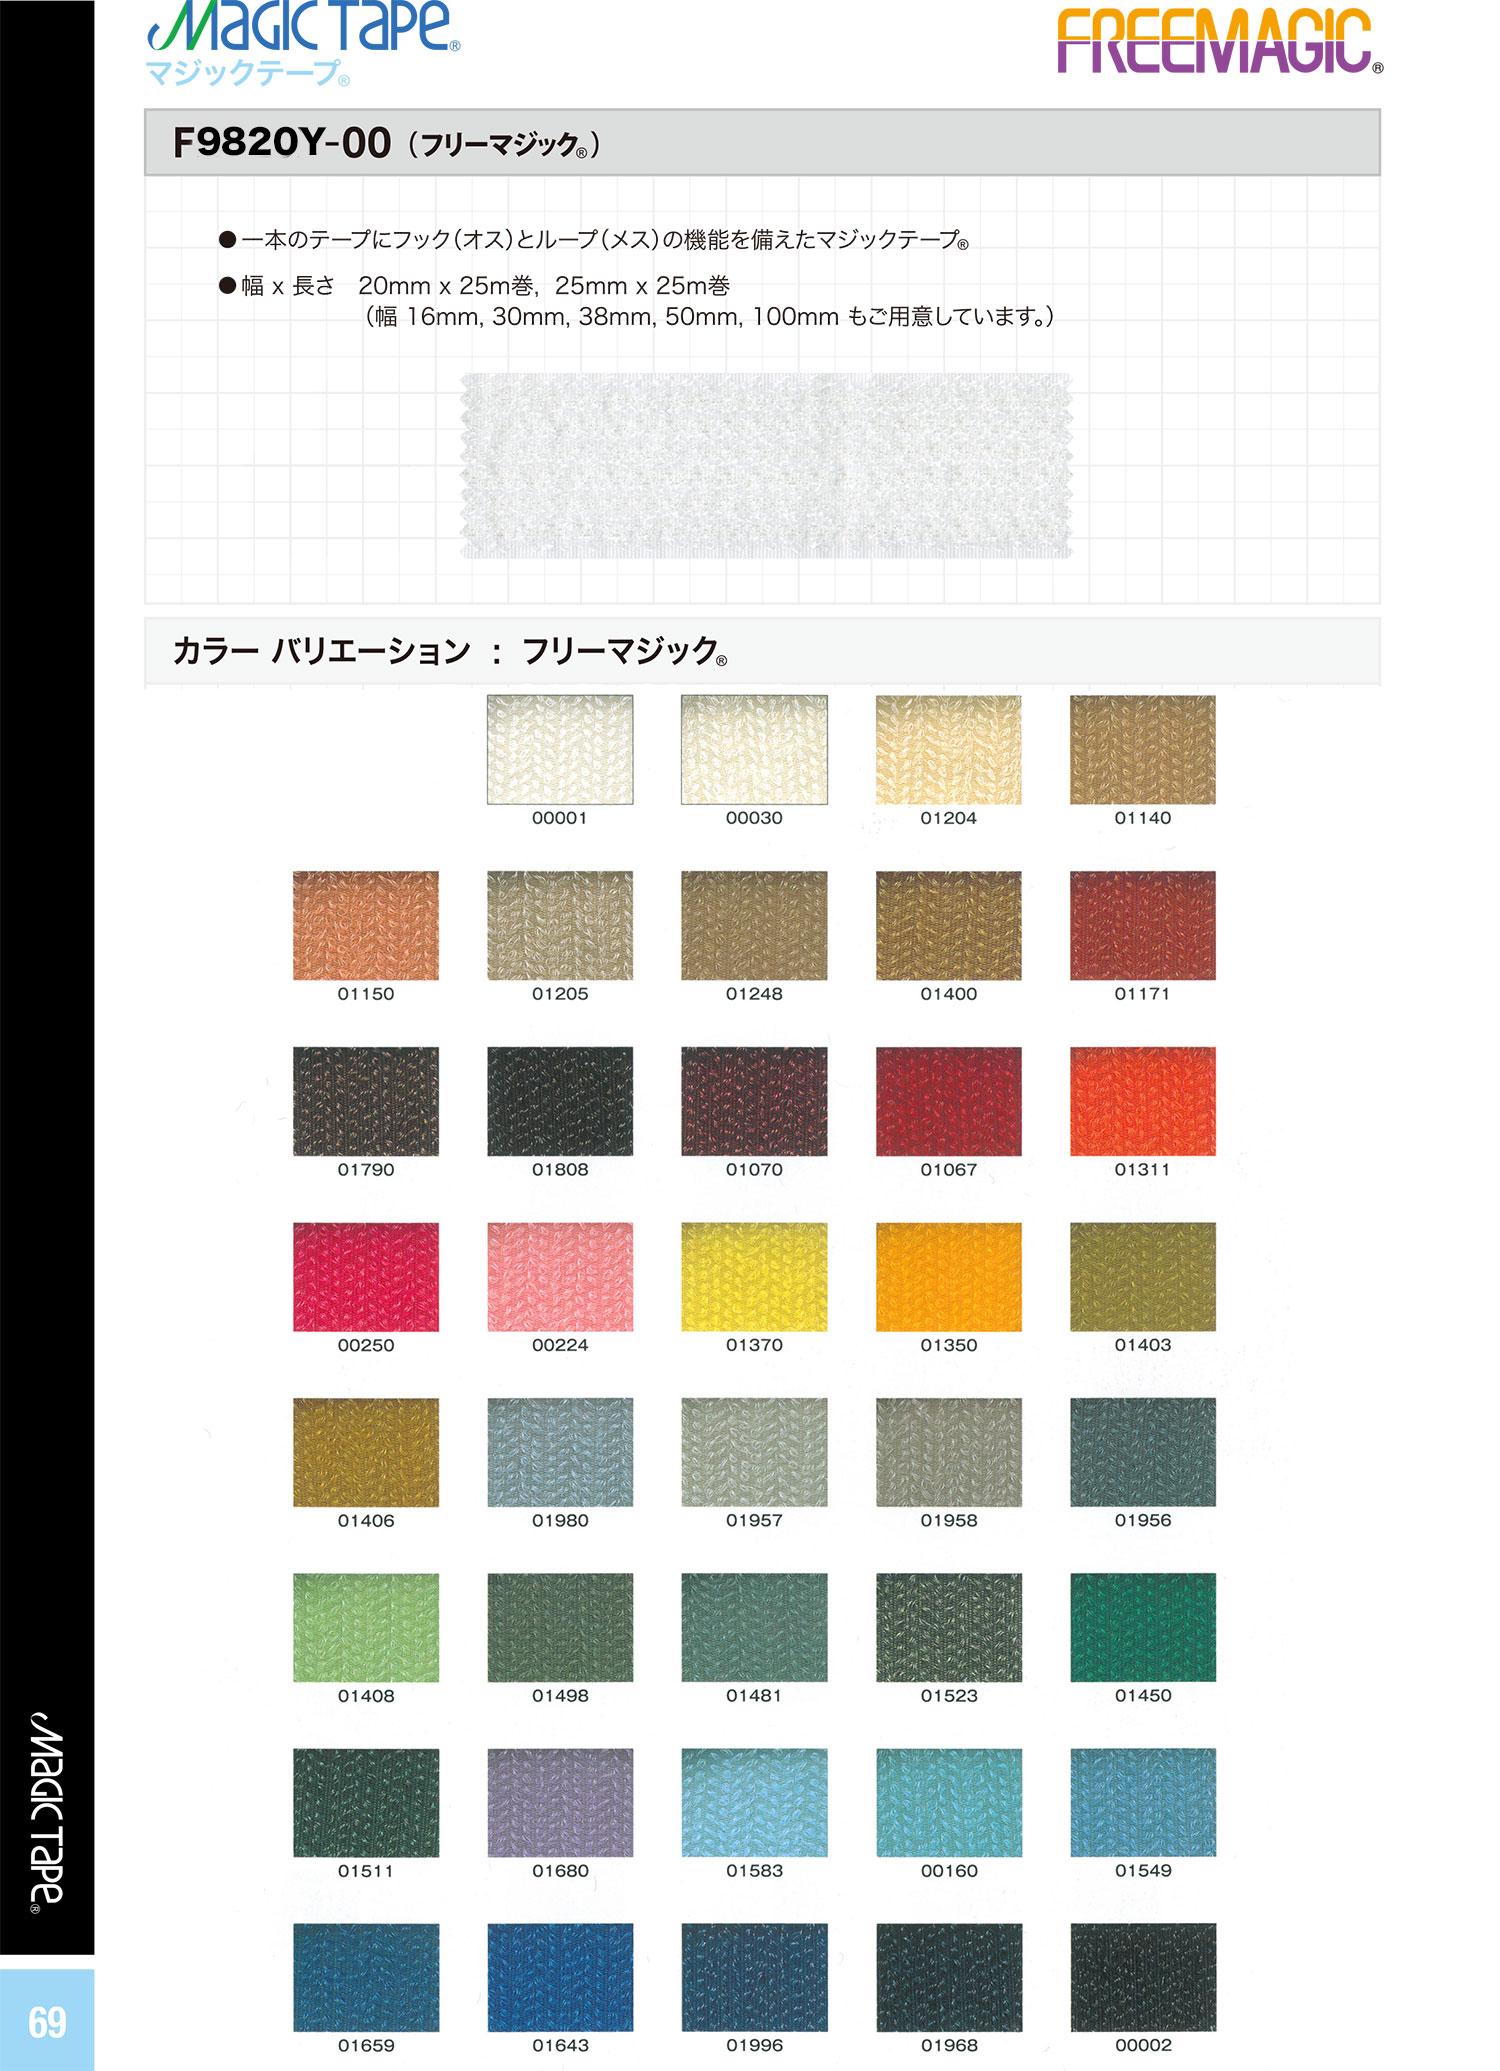 F9820Y.00 フリーマジック[ファスナー] モリト(MORITO)/オークラ商事 - ApparelX アパレル資材卸通販